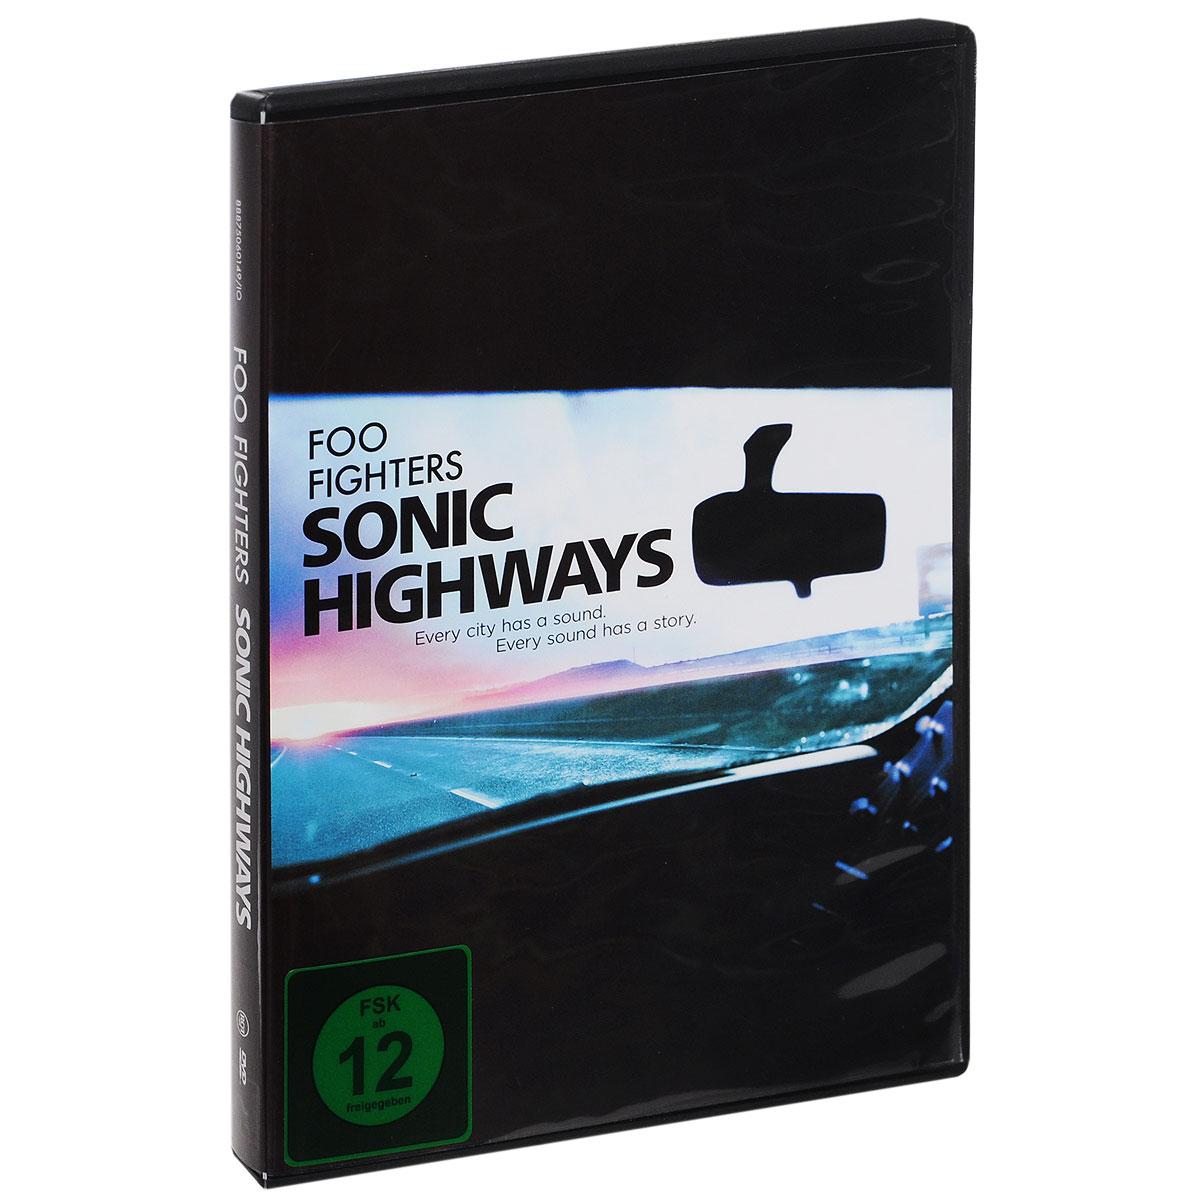 Foo Fighters: Sonic Highways (4 DVD) 2015